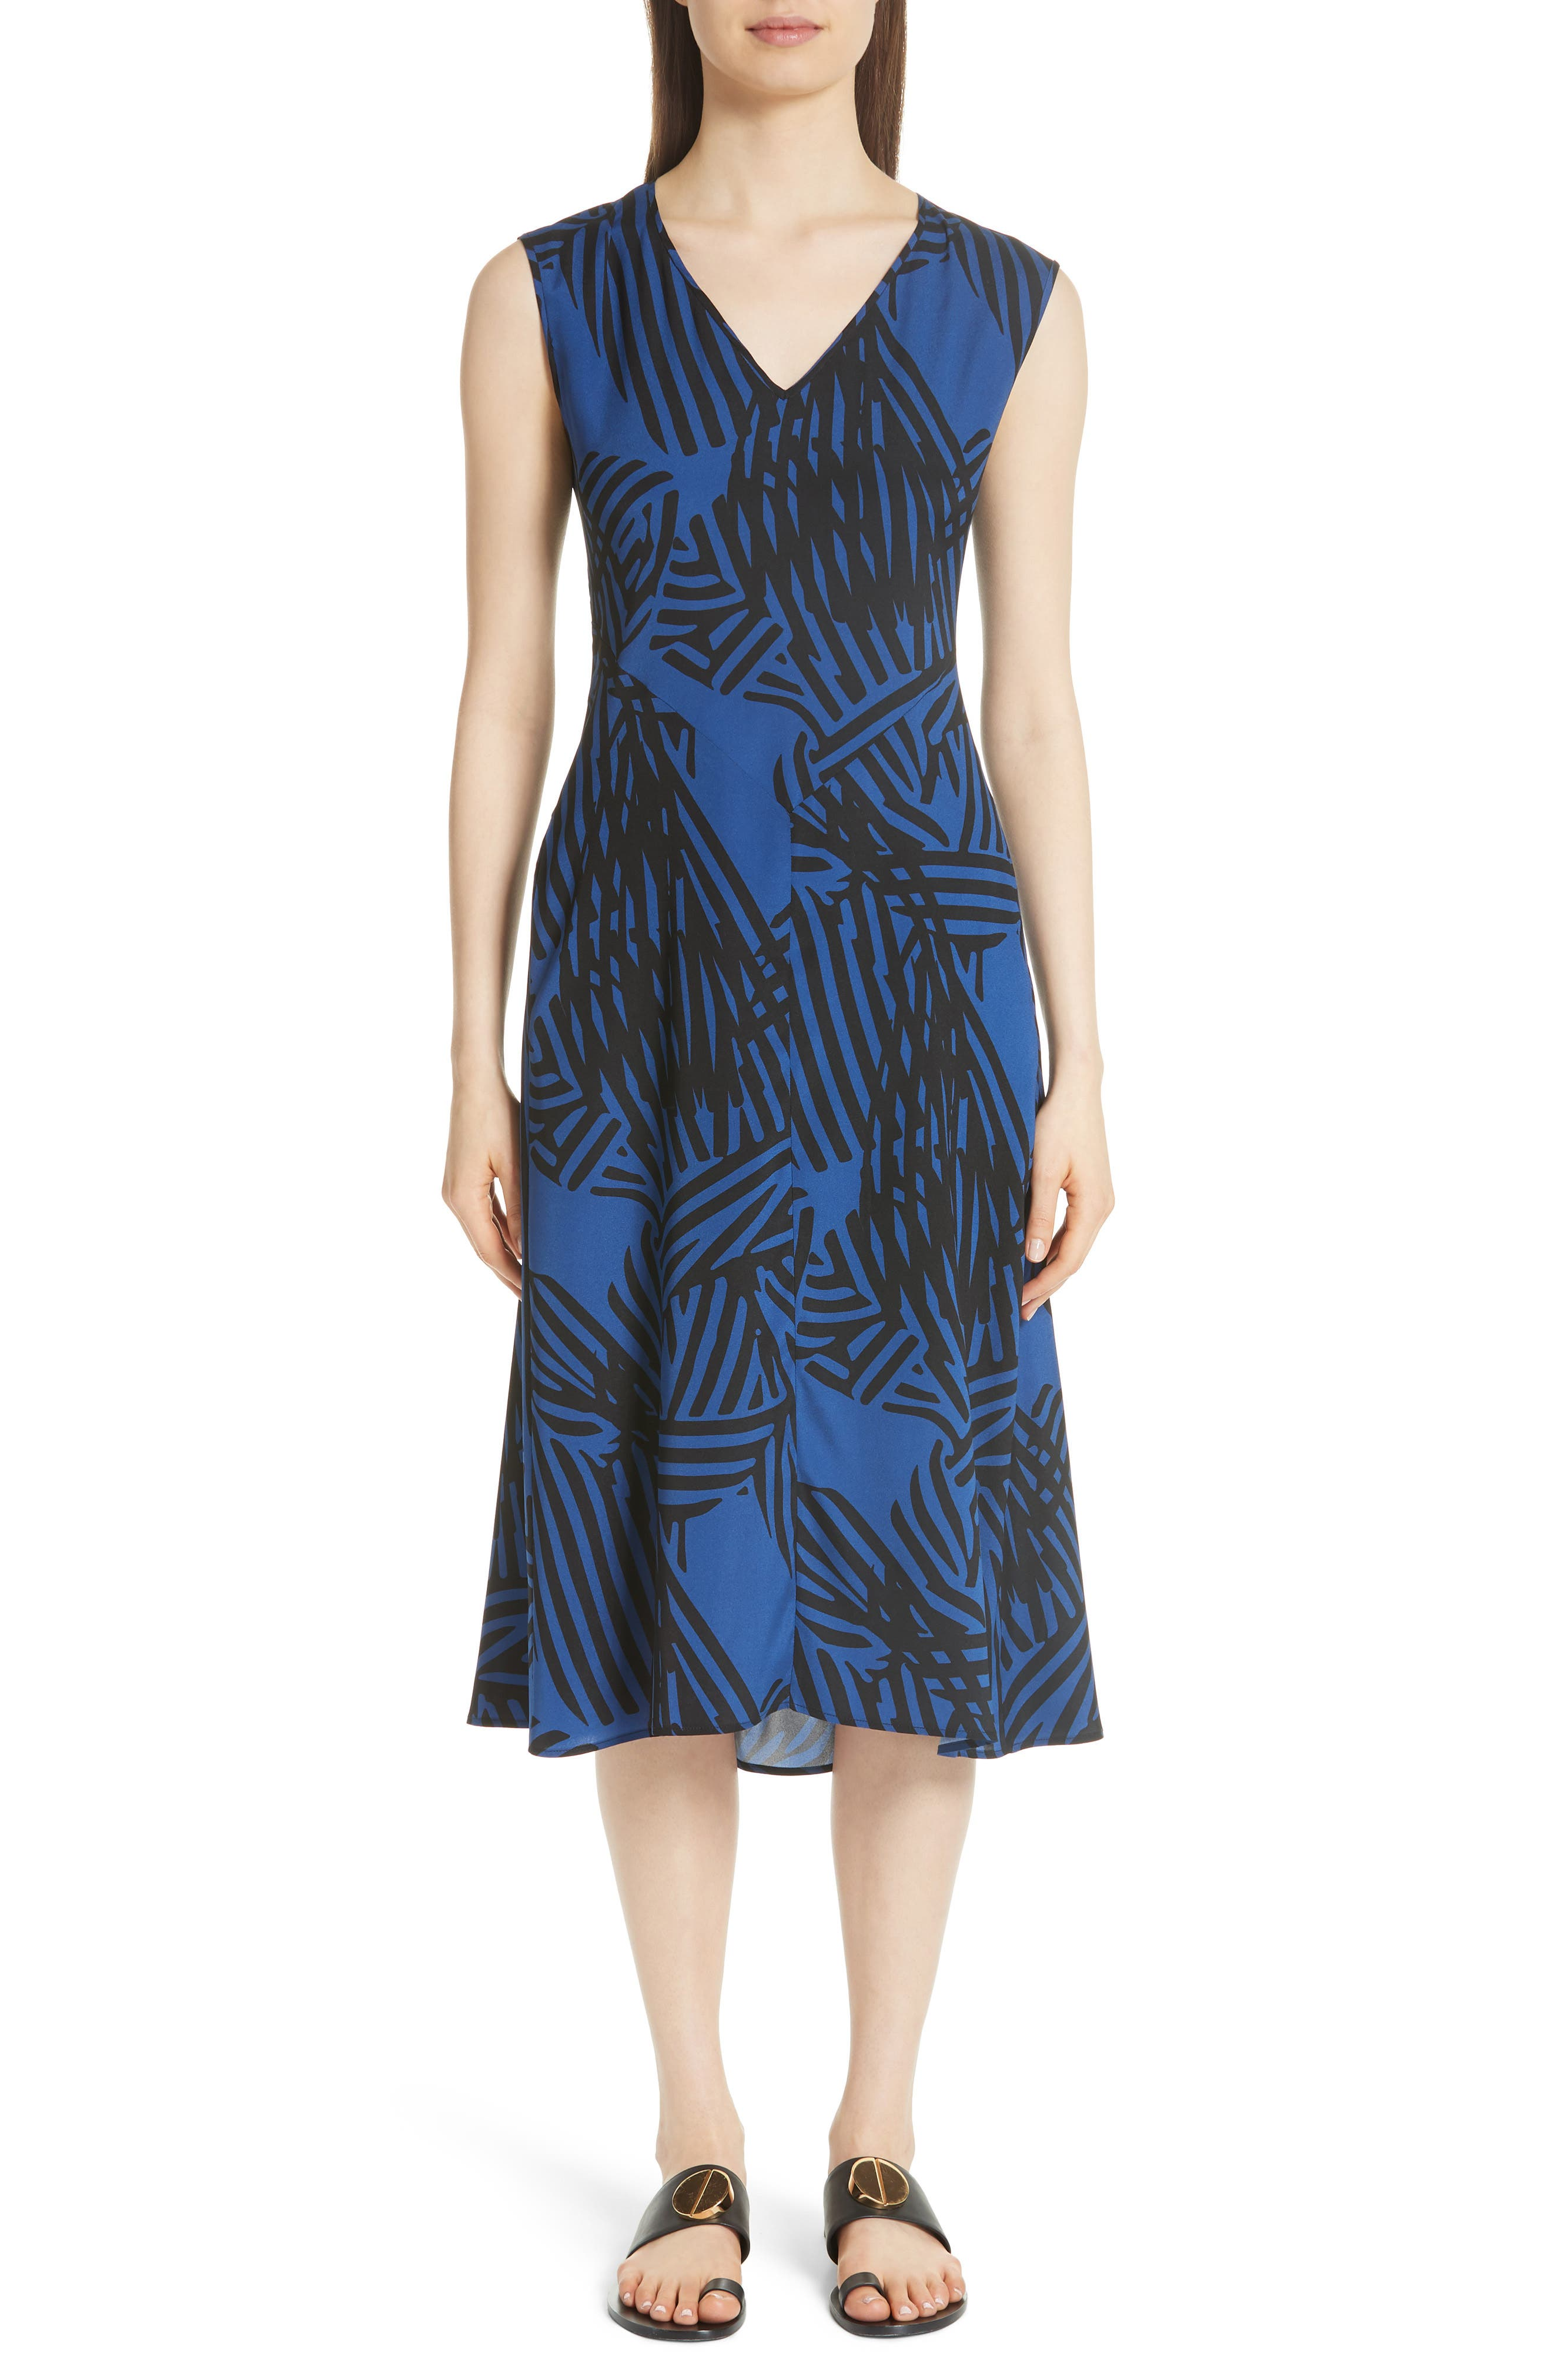 Zero + Maria Cornejo Ribbon Print Stretch Silk Dress